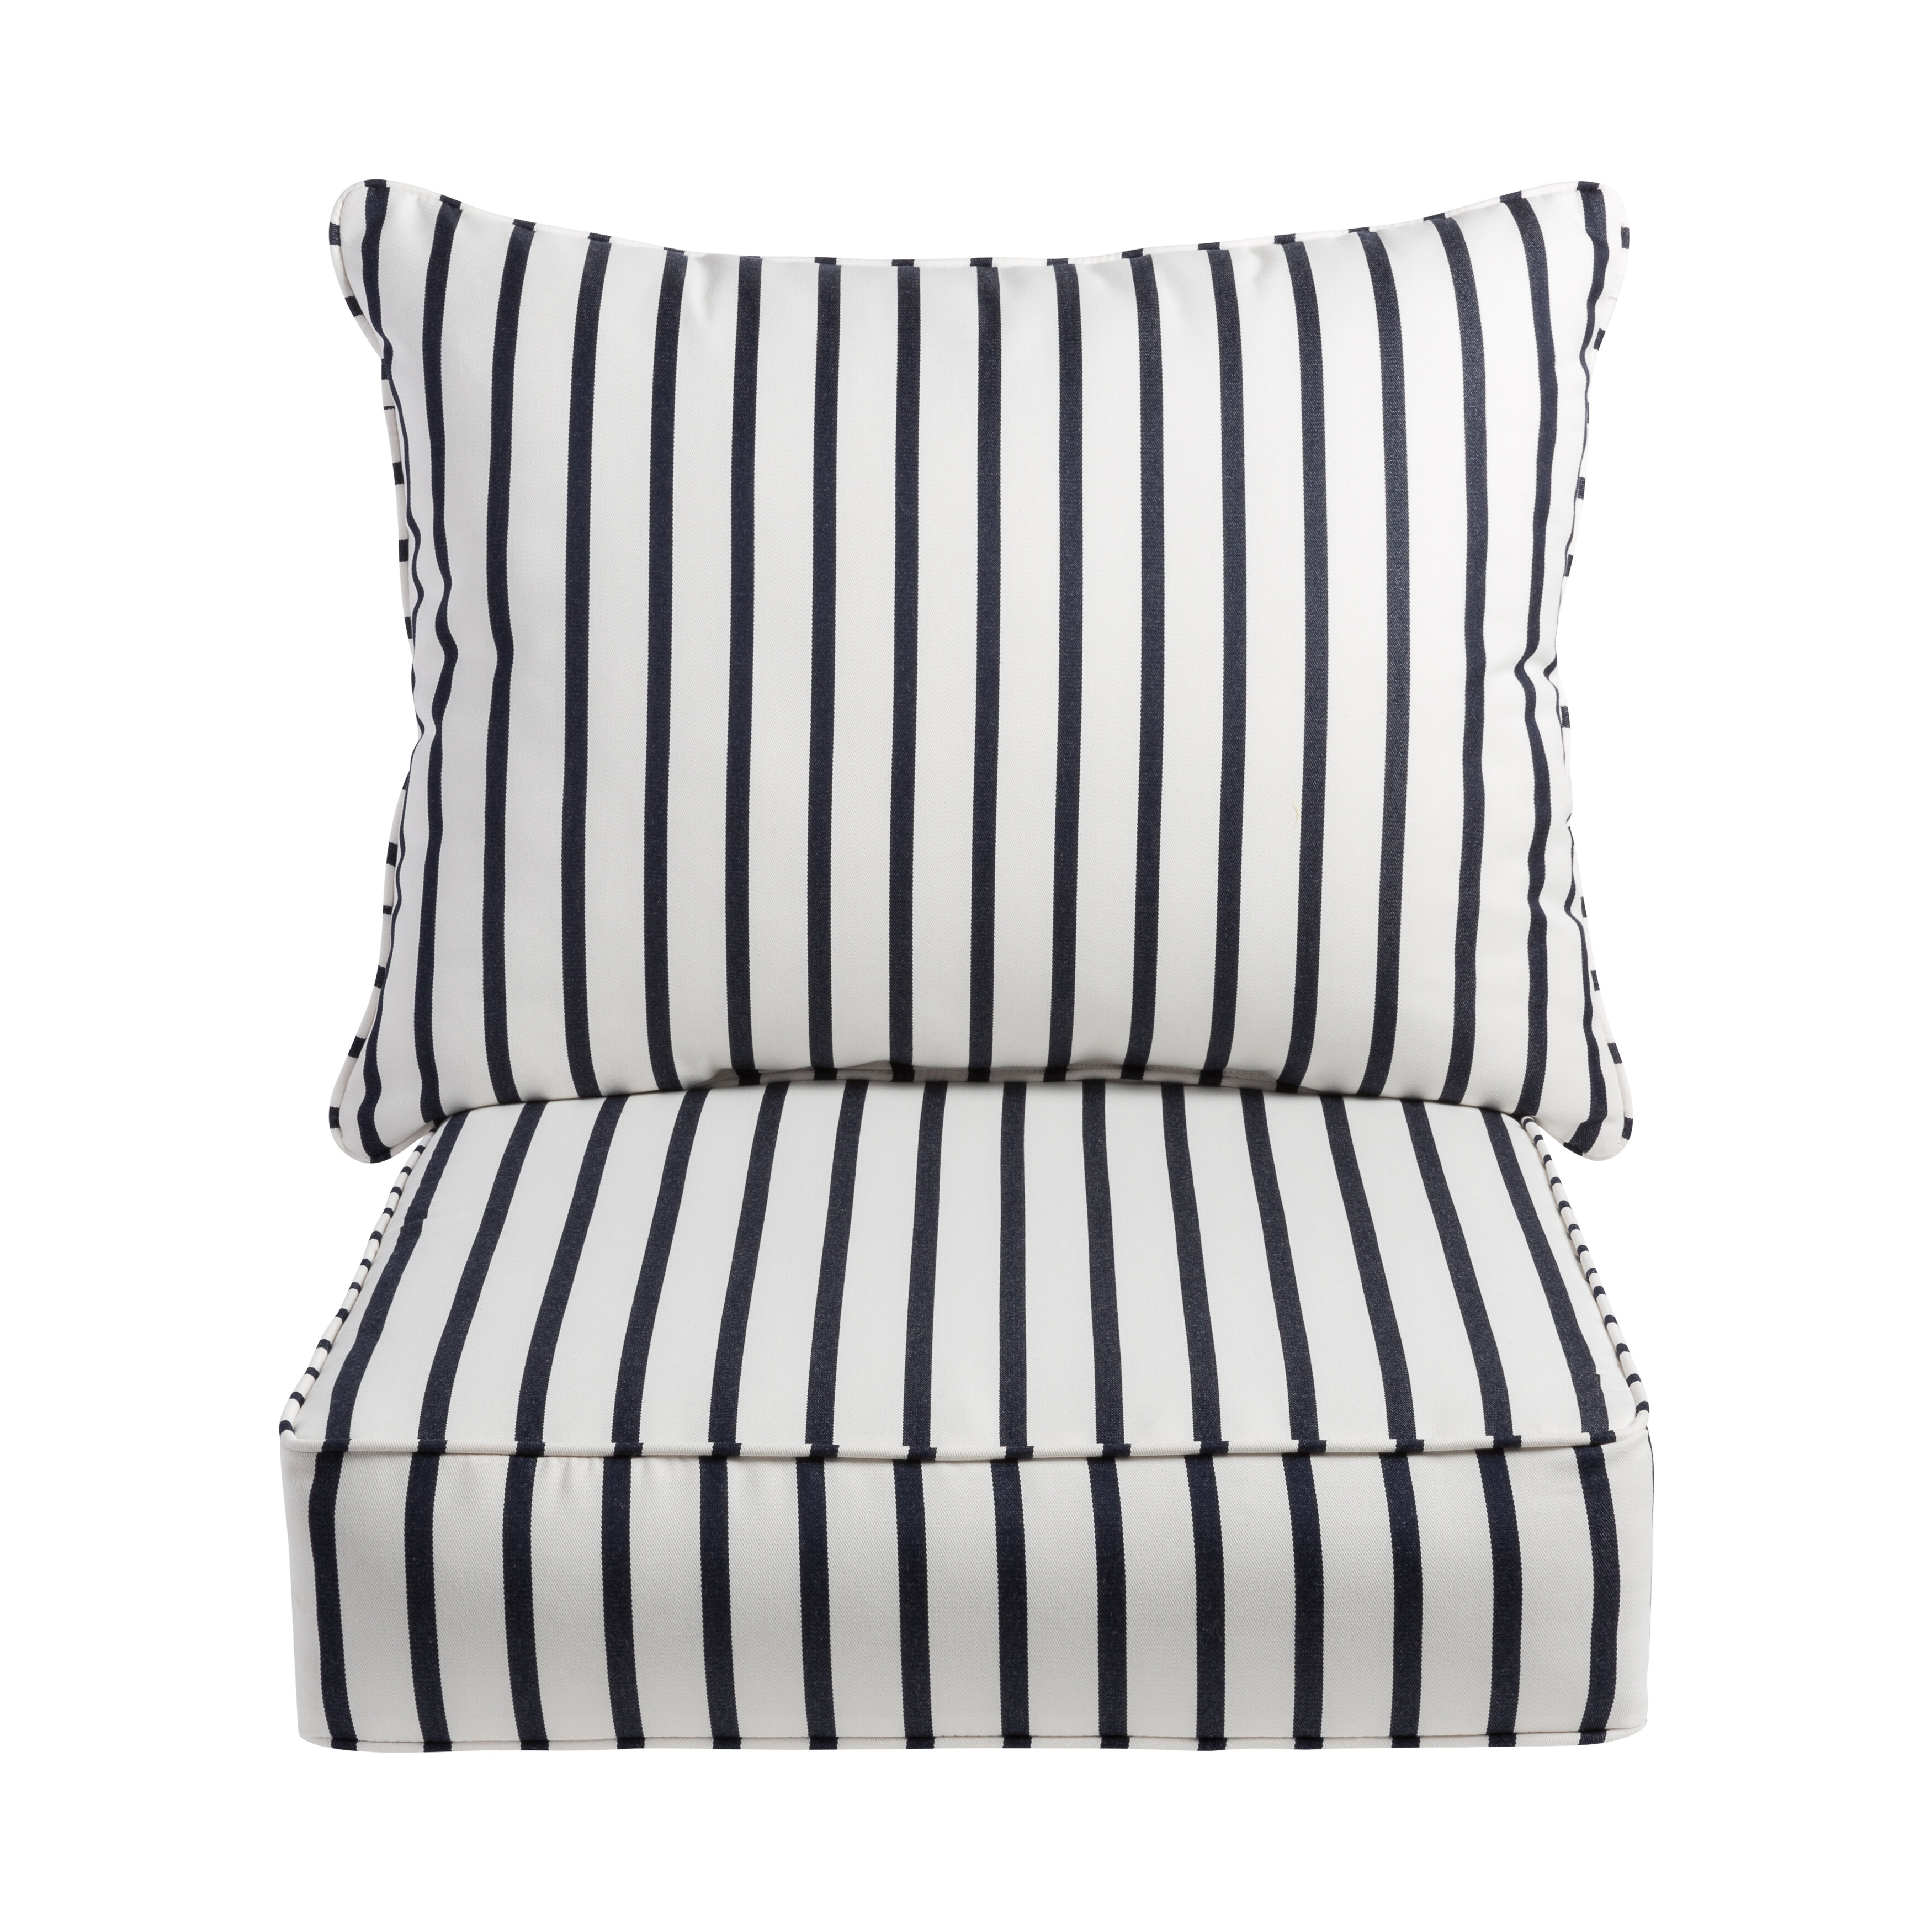 Mercer41 Whitten Stripe Outdoor Sunbrella Seat Back Cushion Reviews Wayfair